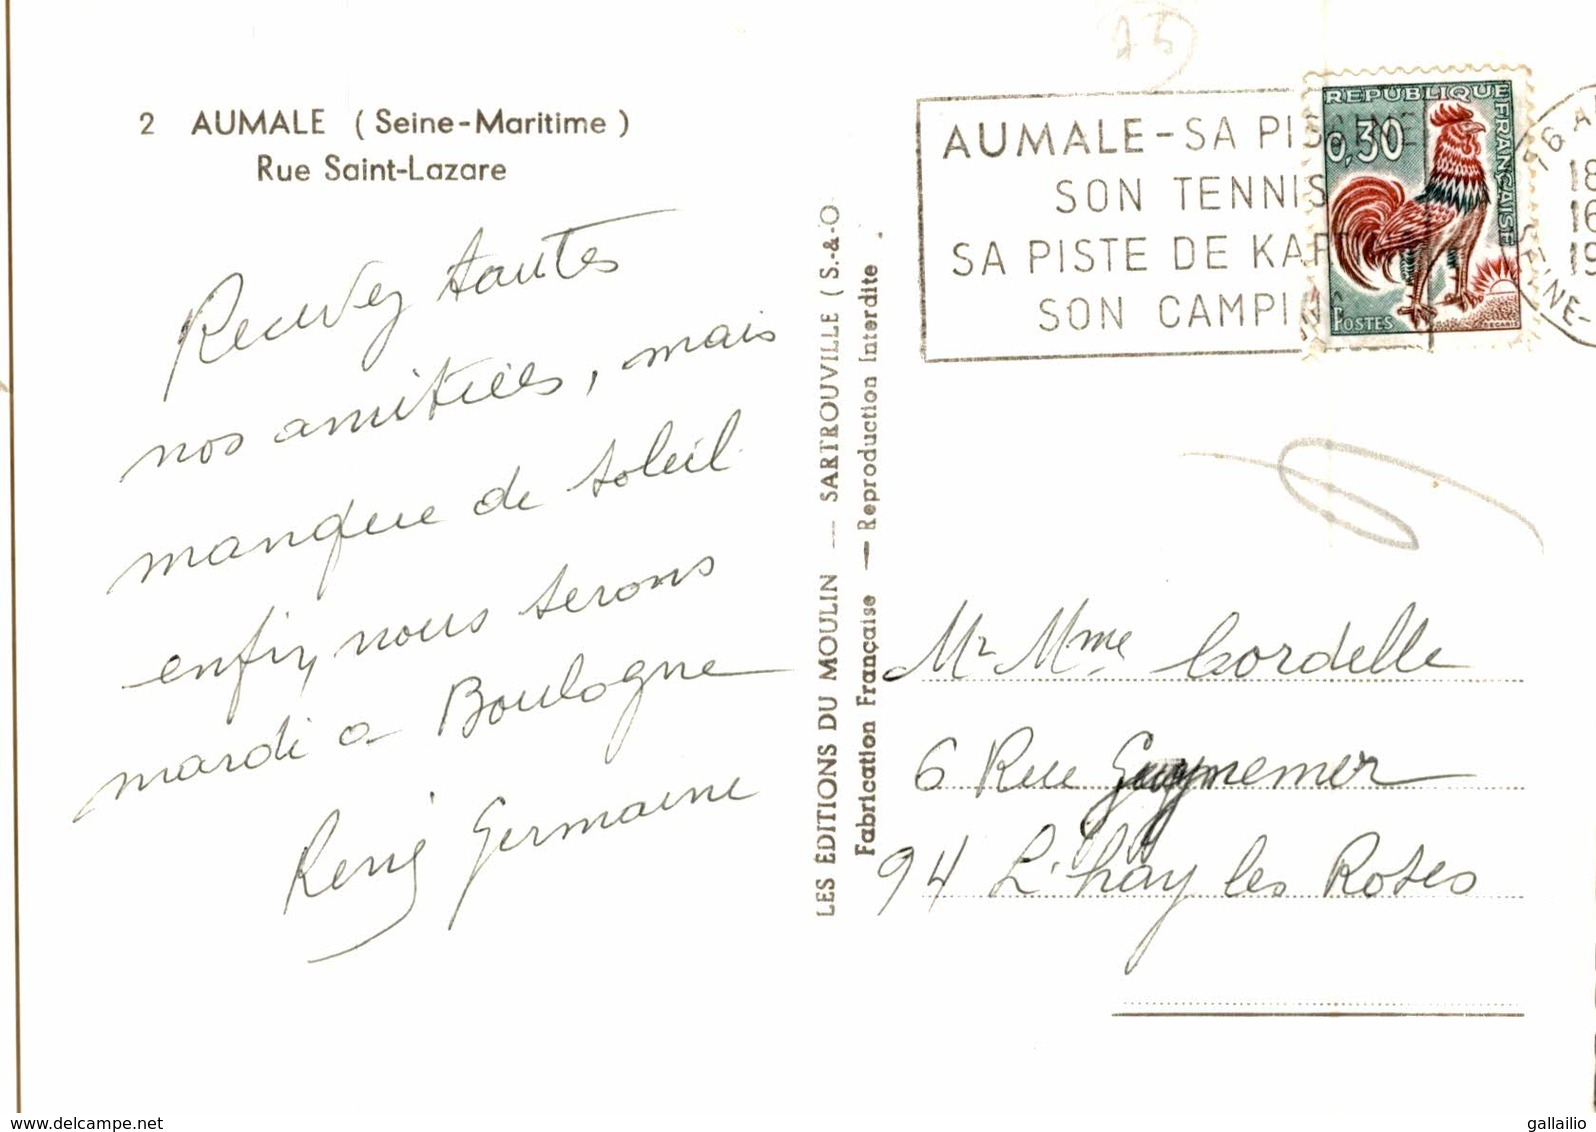 AUMALE RUE SAINT LAZARE - Aumale